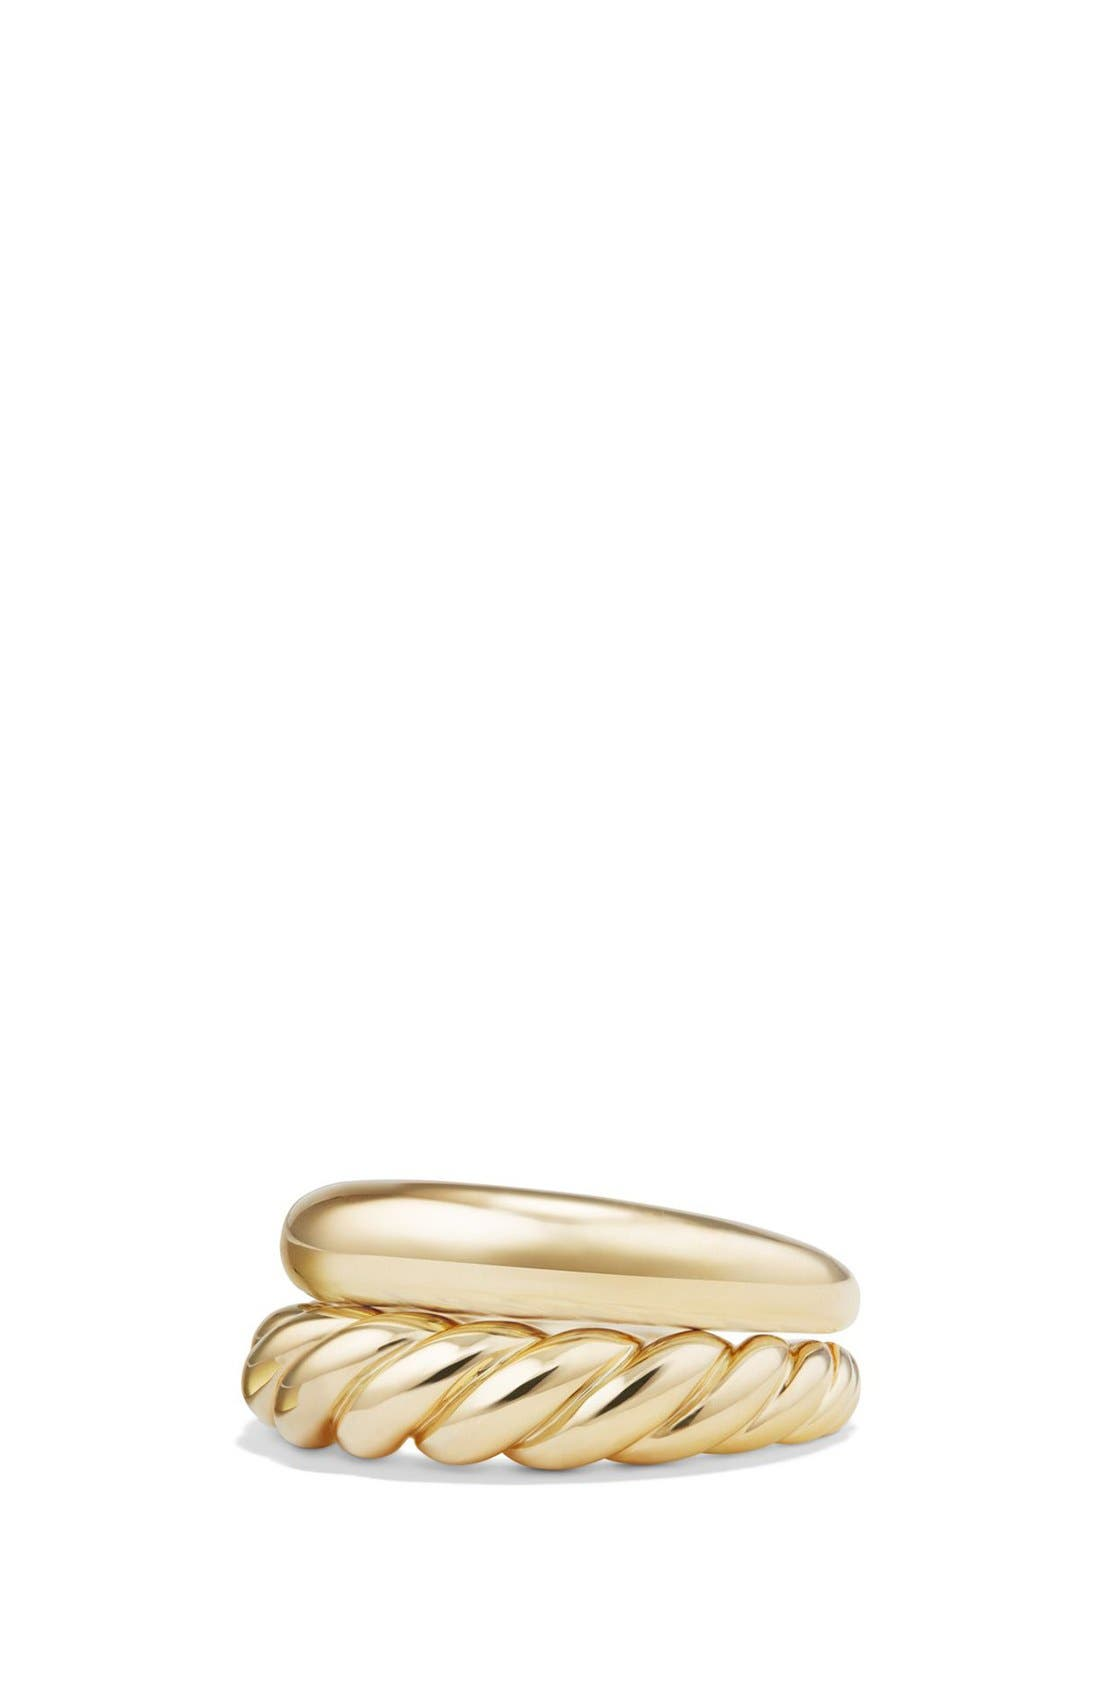 Main Image - David Yurman 'Pure Form' Stack Rings in 18K Gold